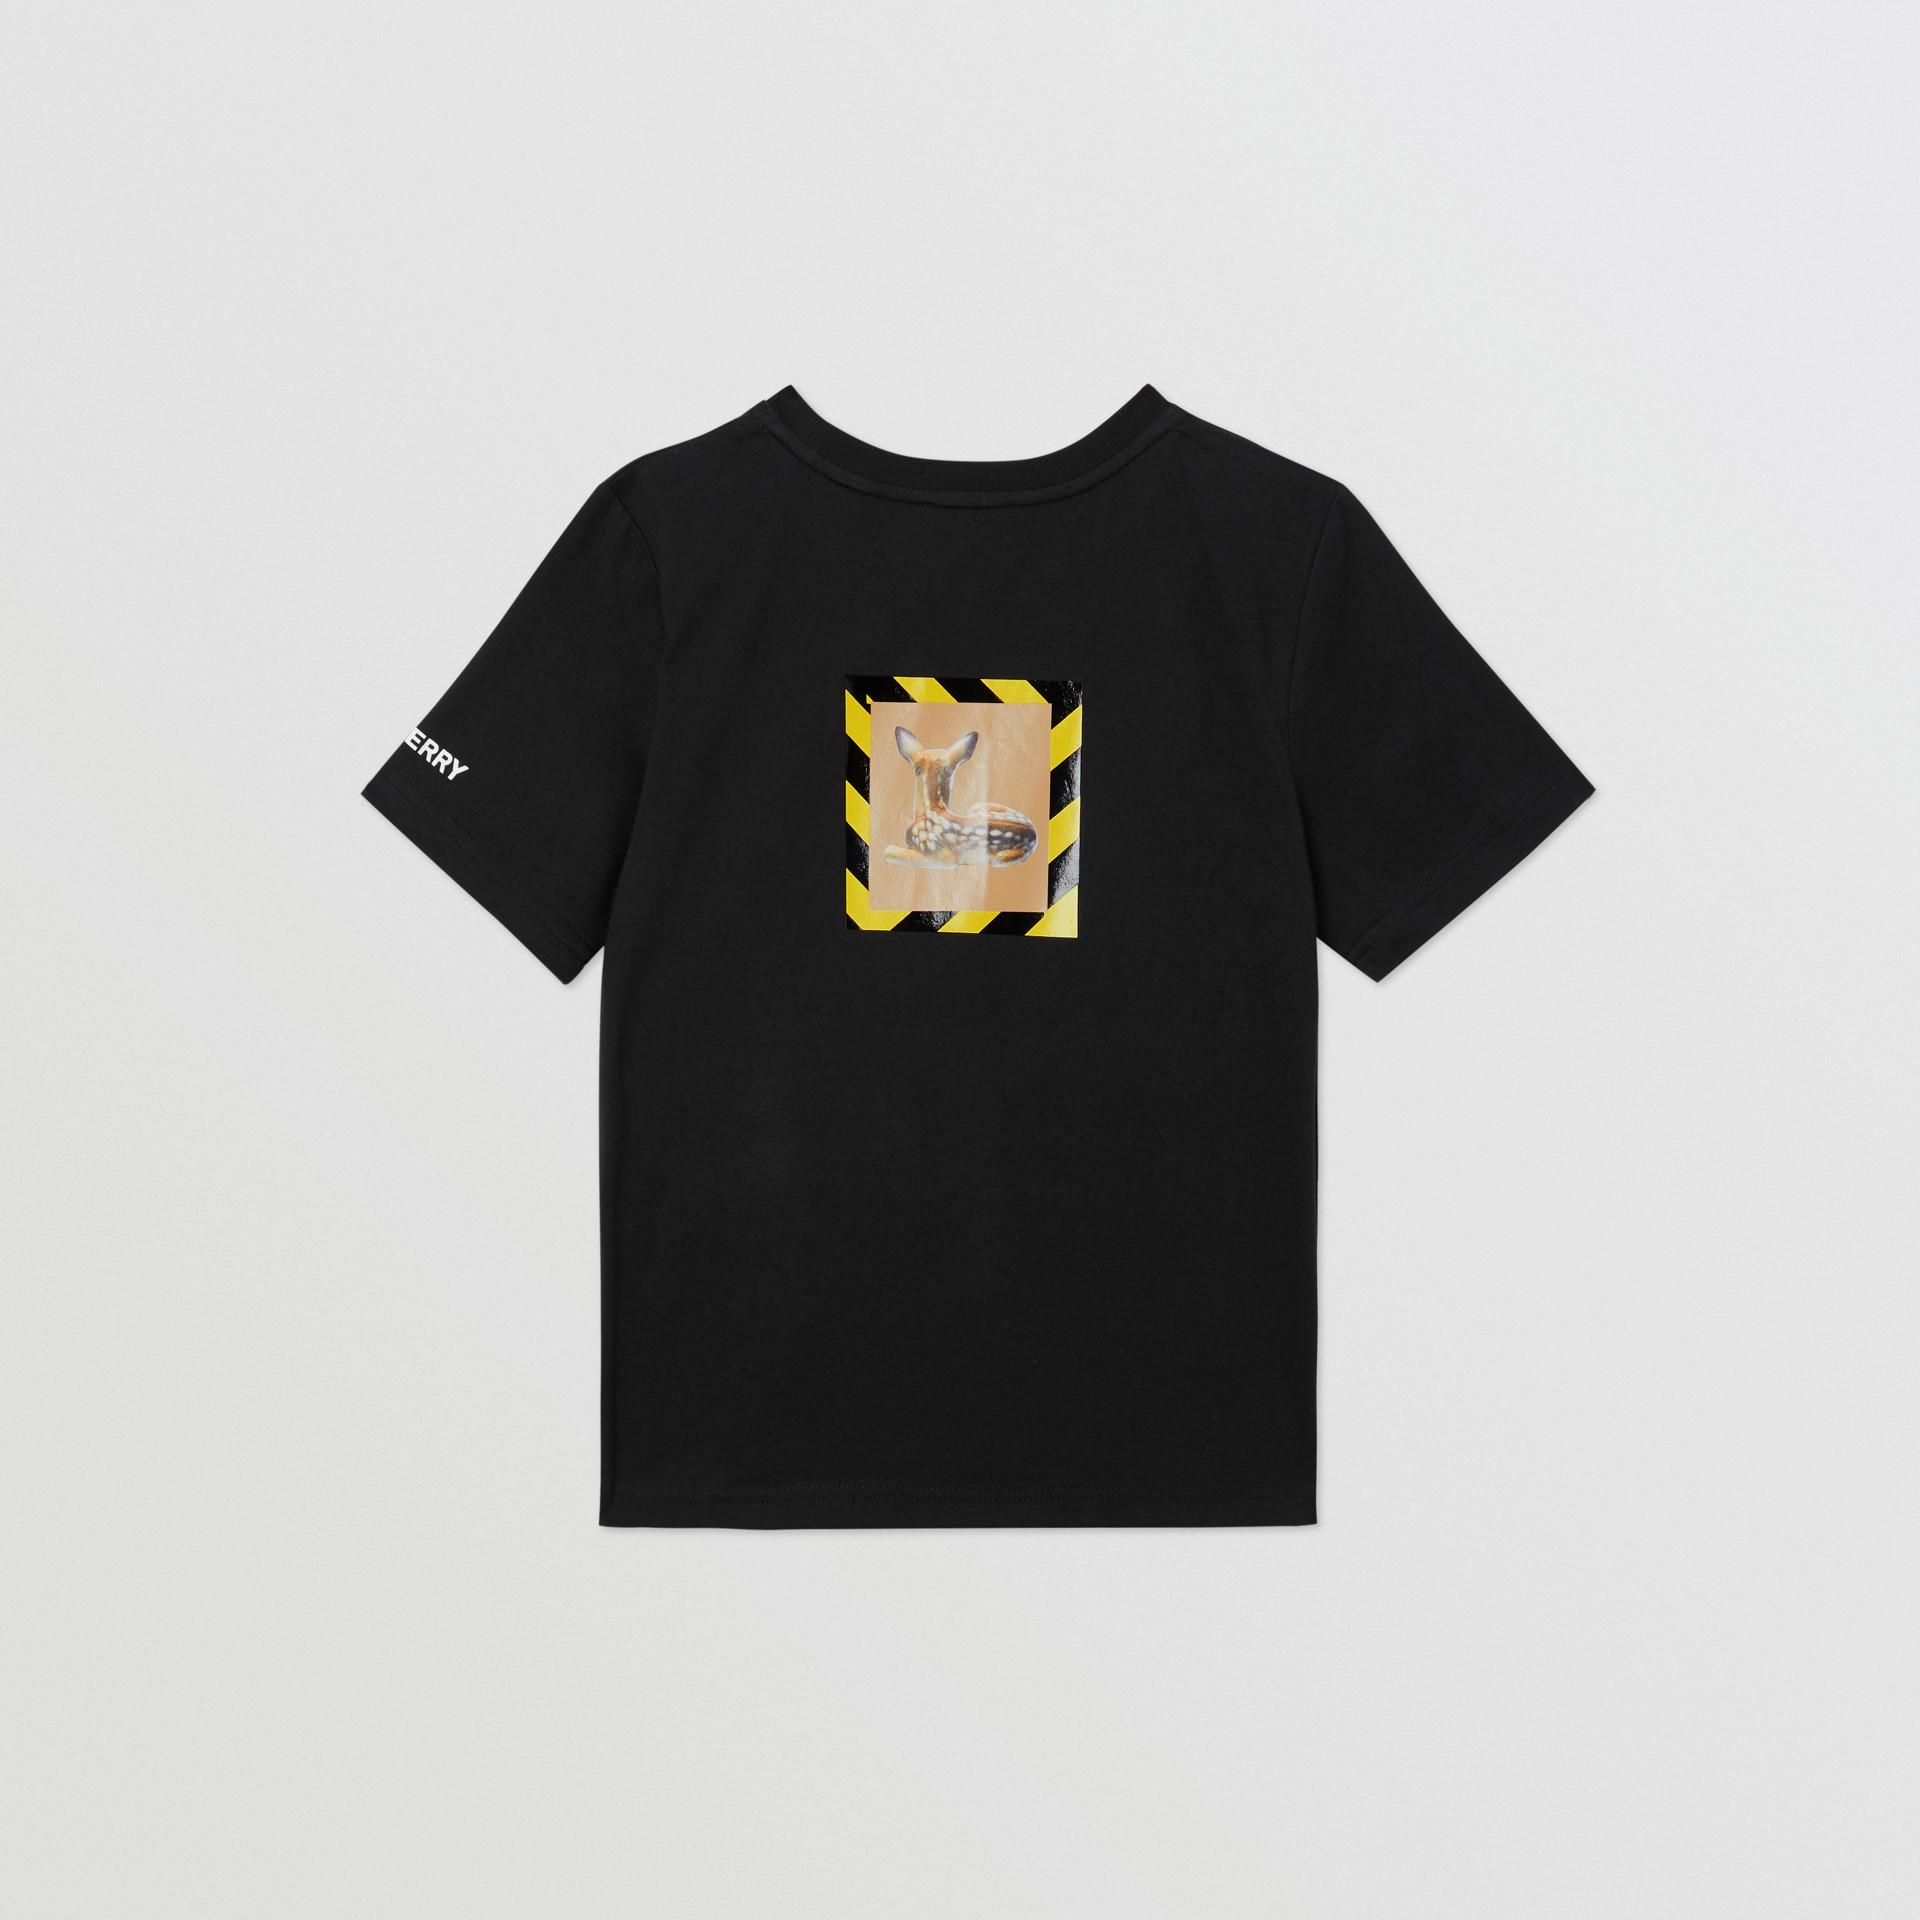 Deer Print Cotton T-shirt in Black   Burberry - gallery image 4